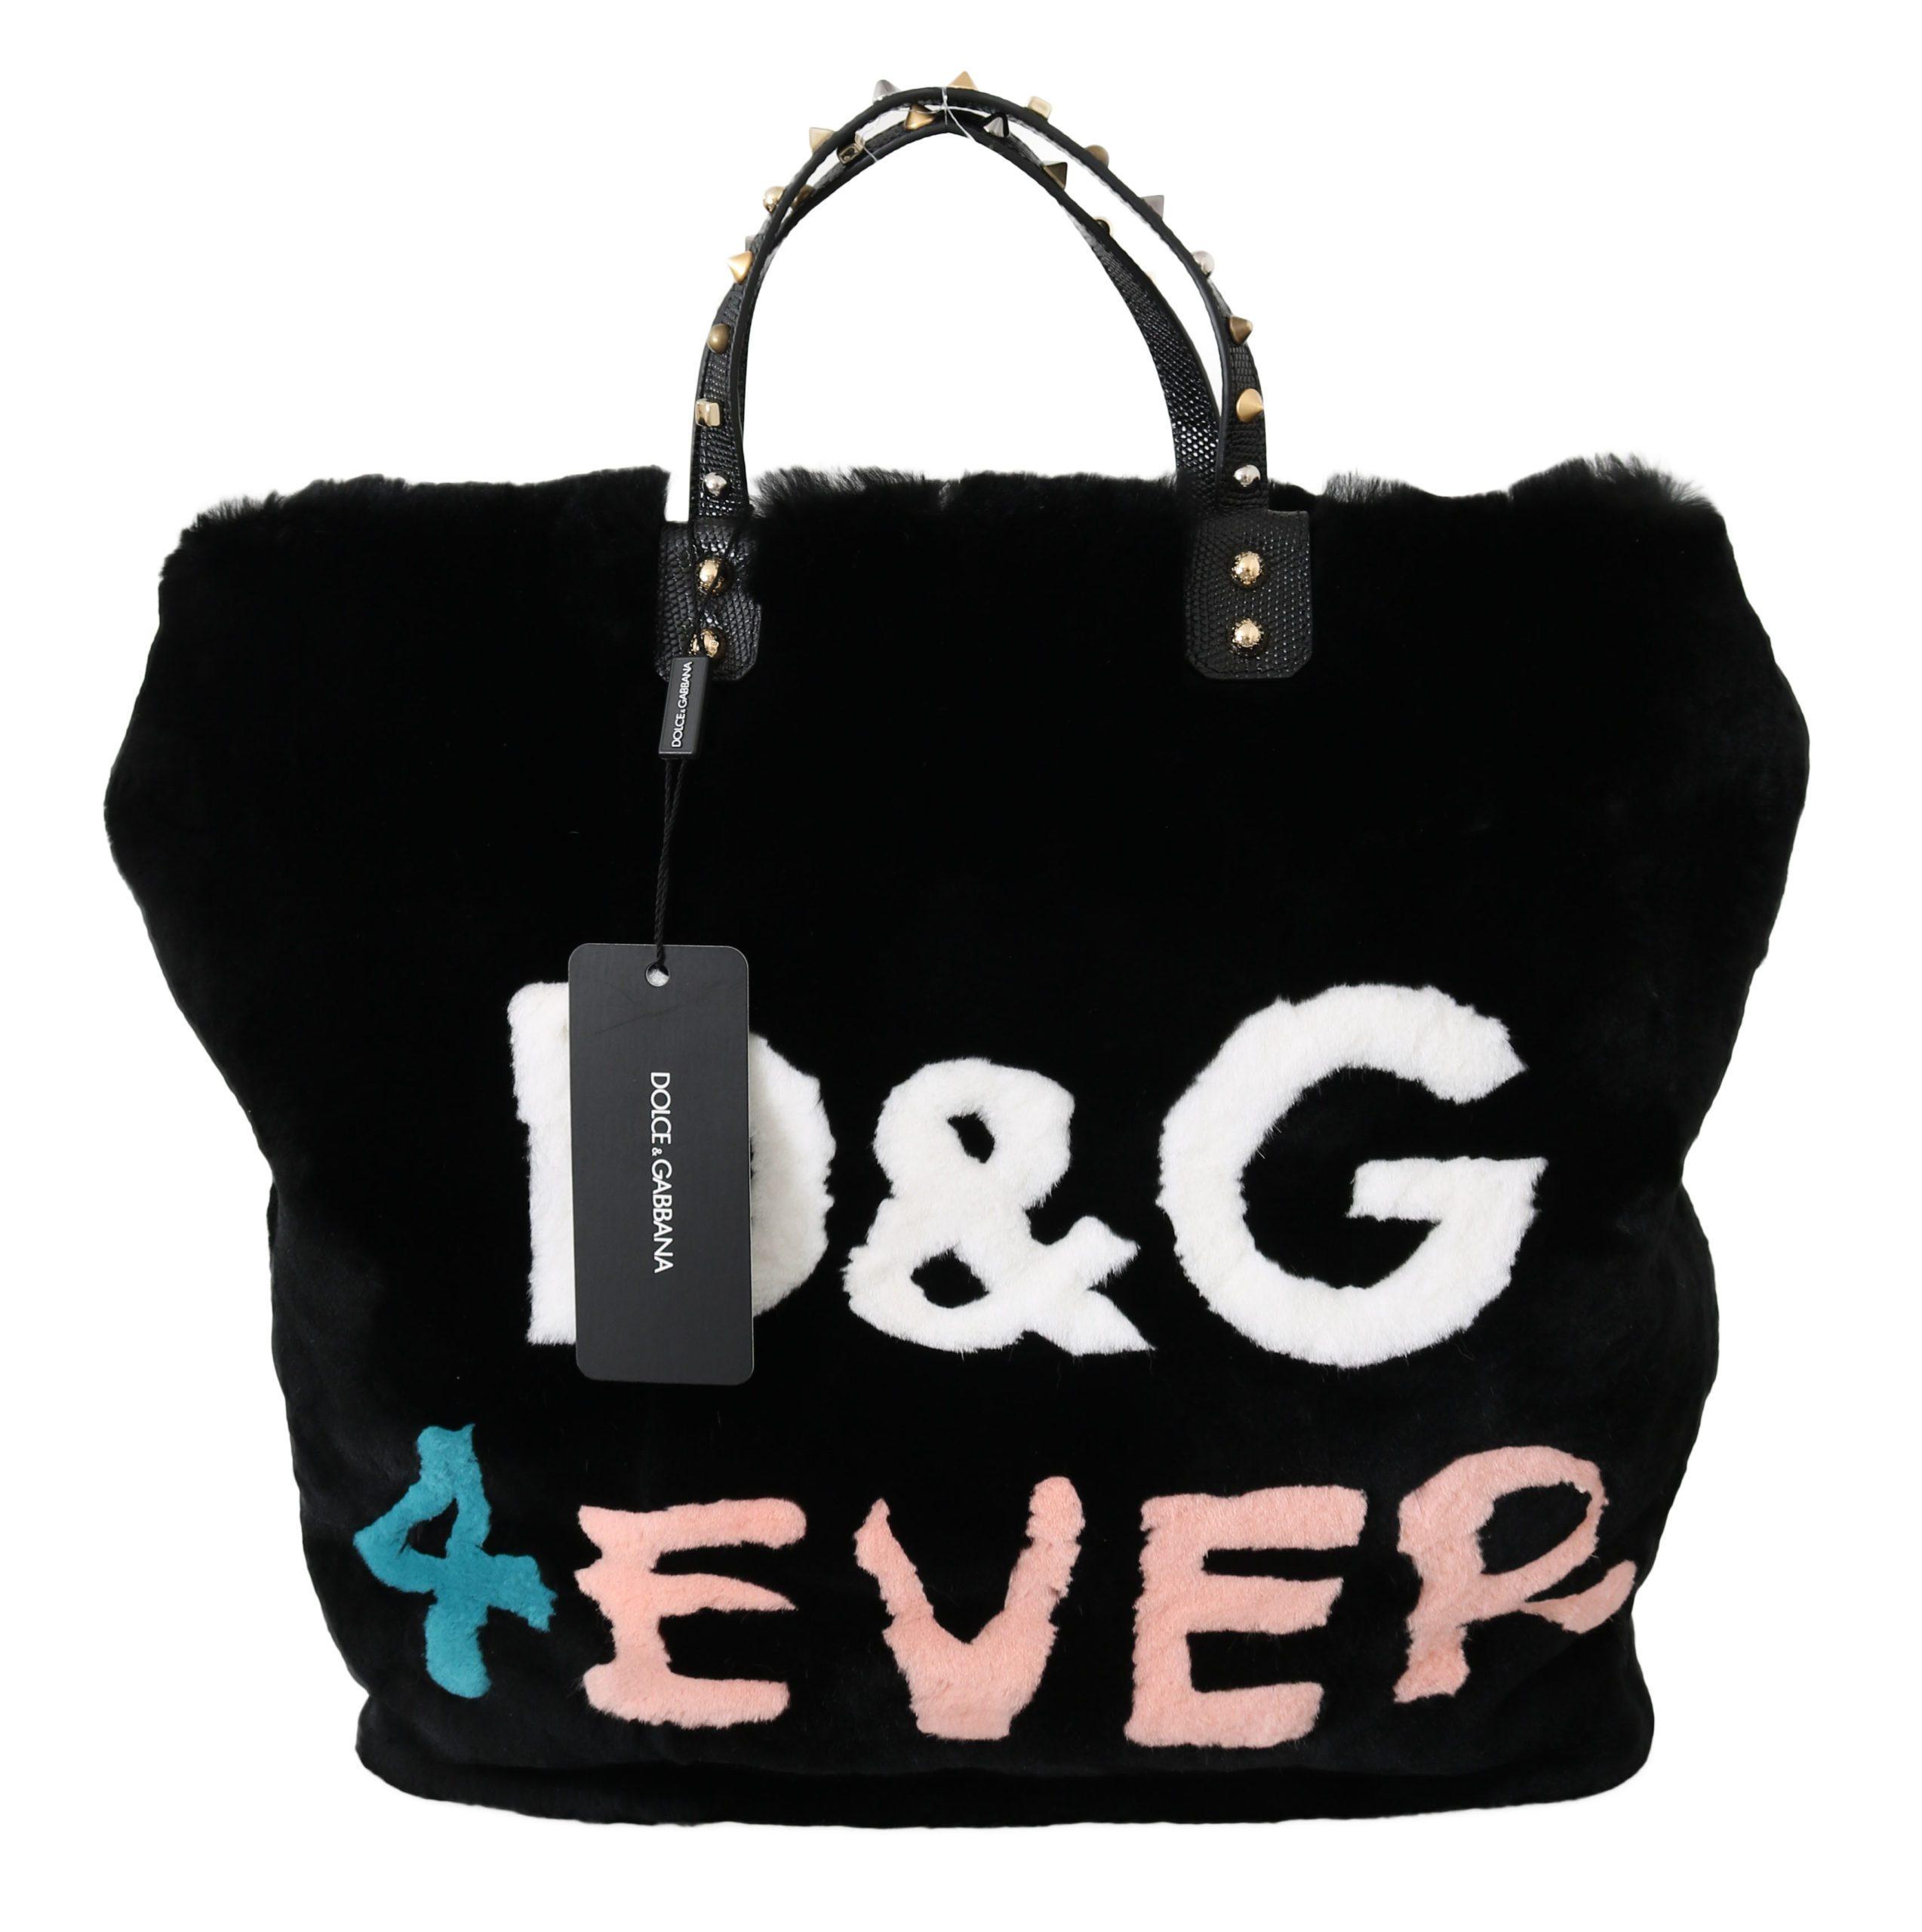 Dolce & Gabbana Women's Inlays Sling Fur Handbag Black VAS8793